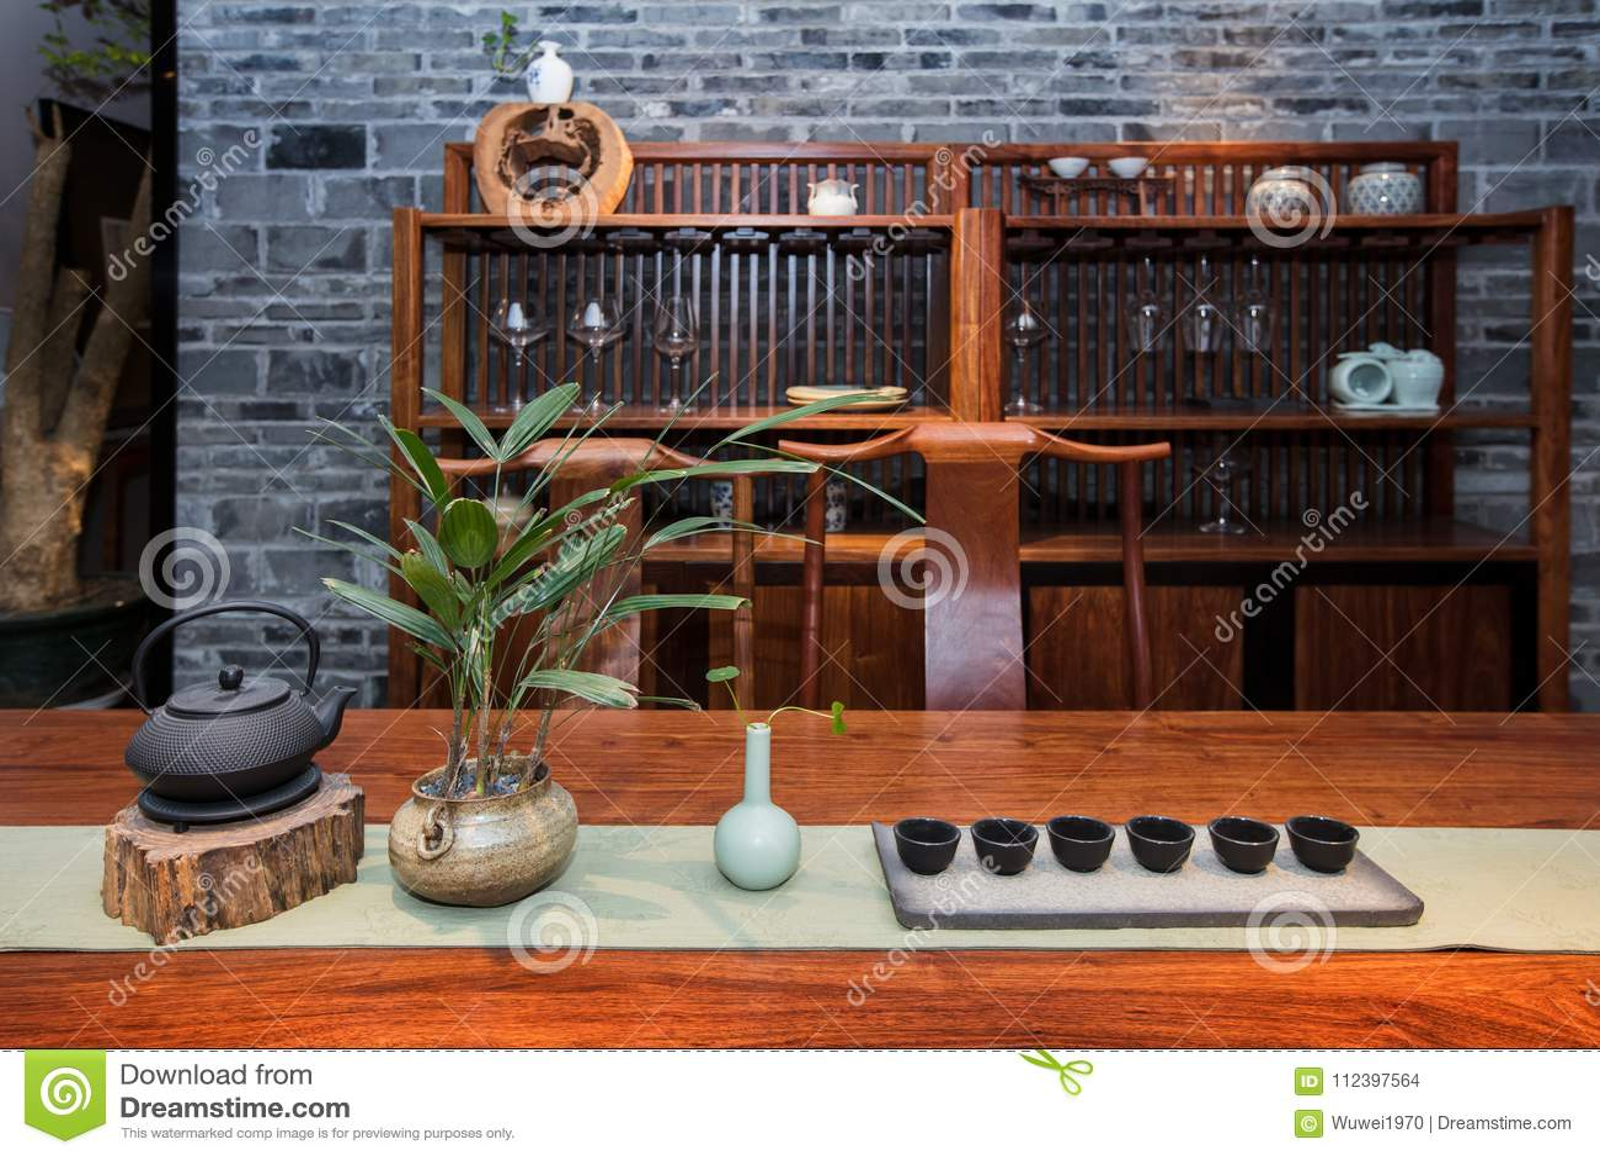 El salón de té de familias chinas modernas